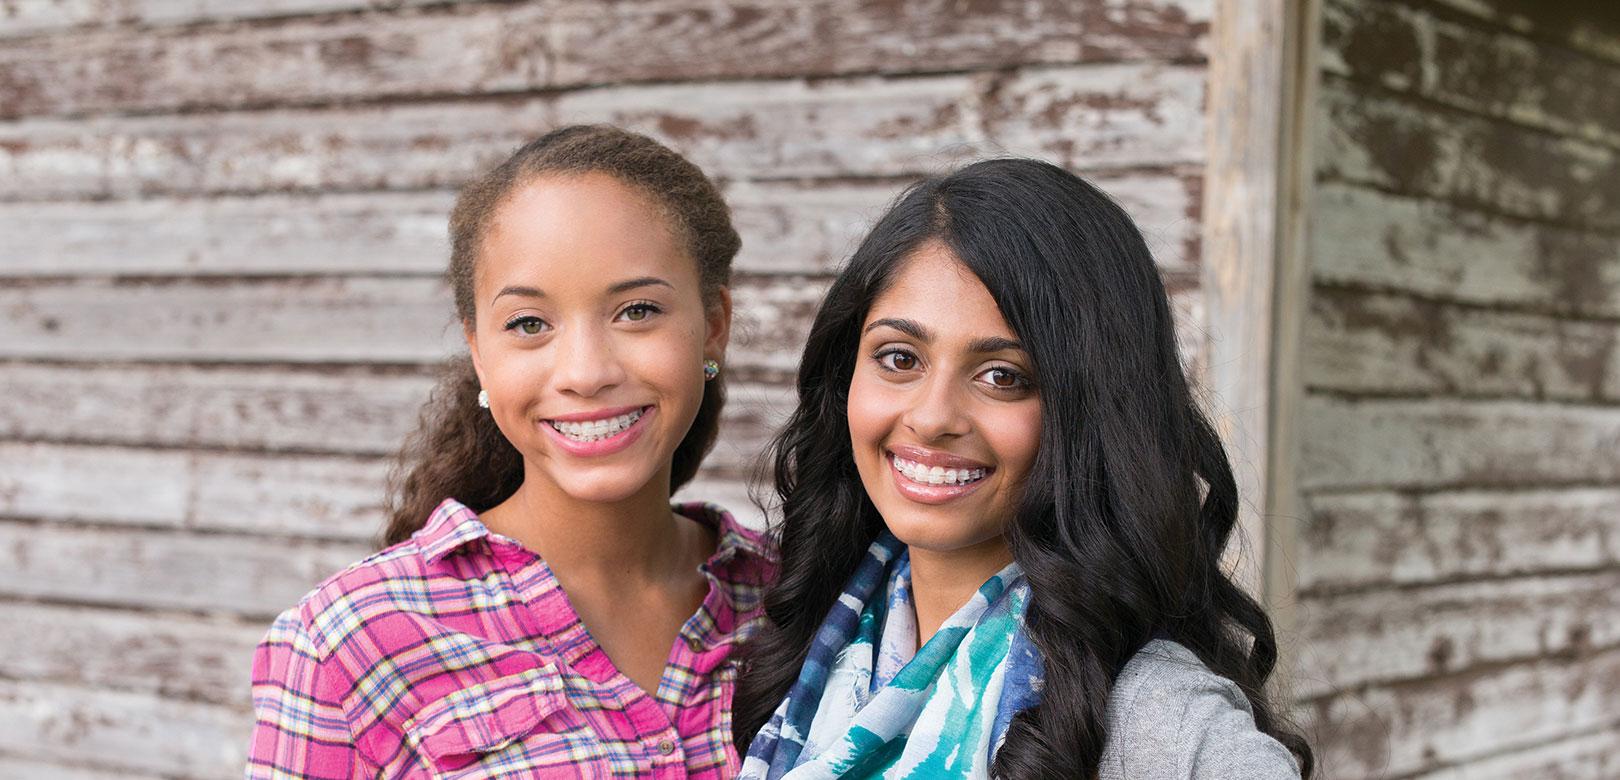 Fabulous Smiles Orthodontics Treatment Teen Adolescent Smiling